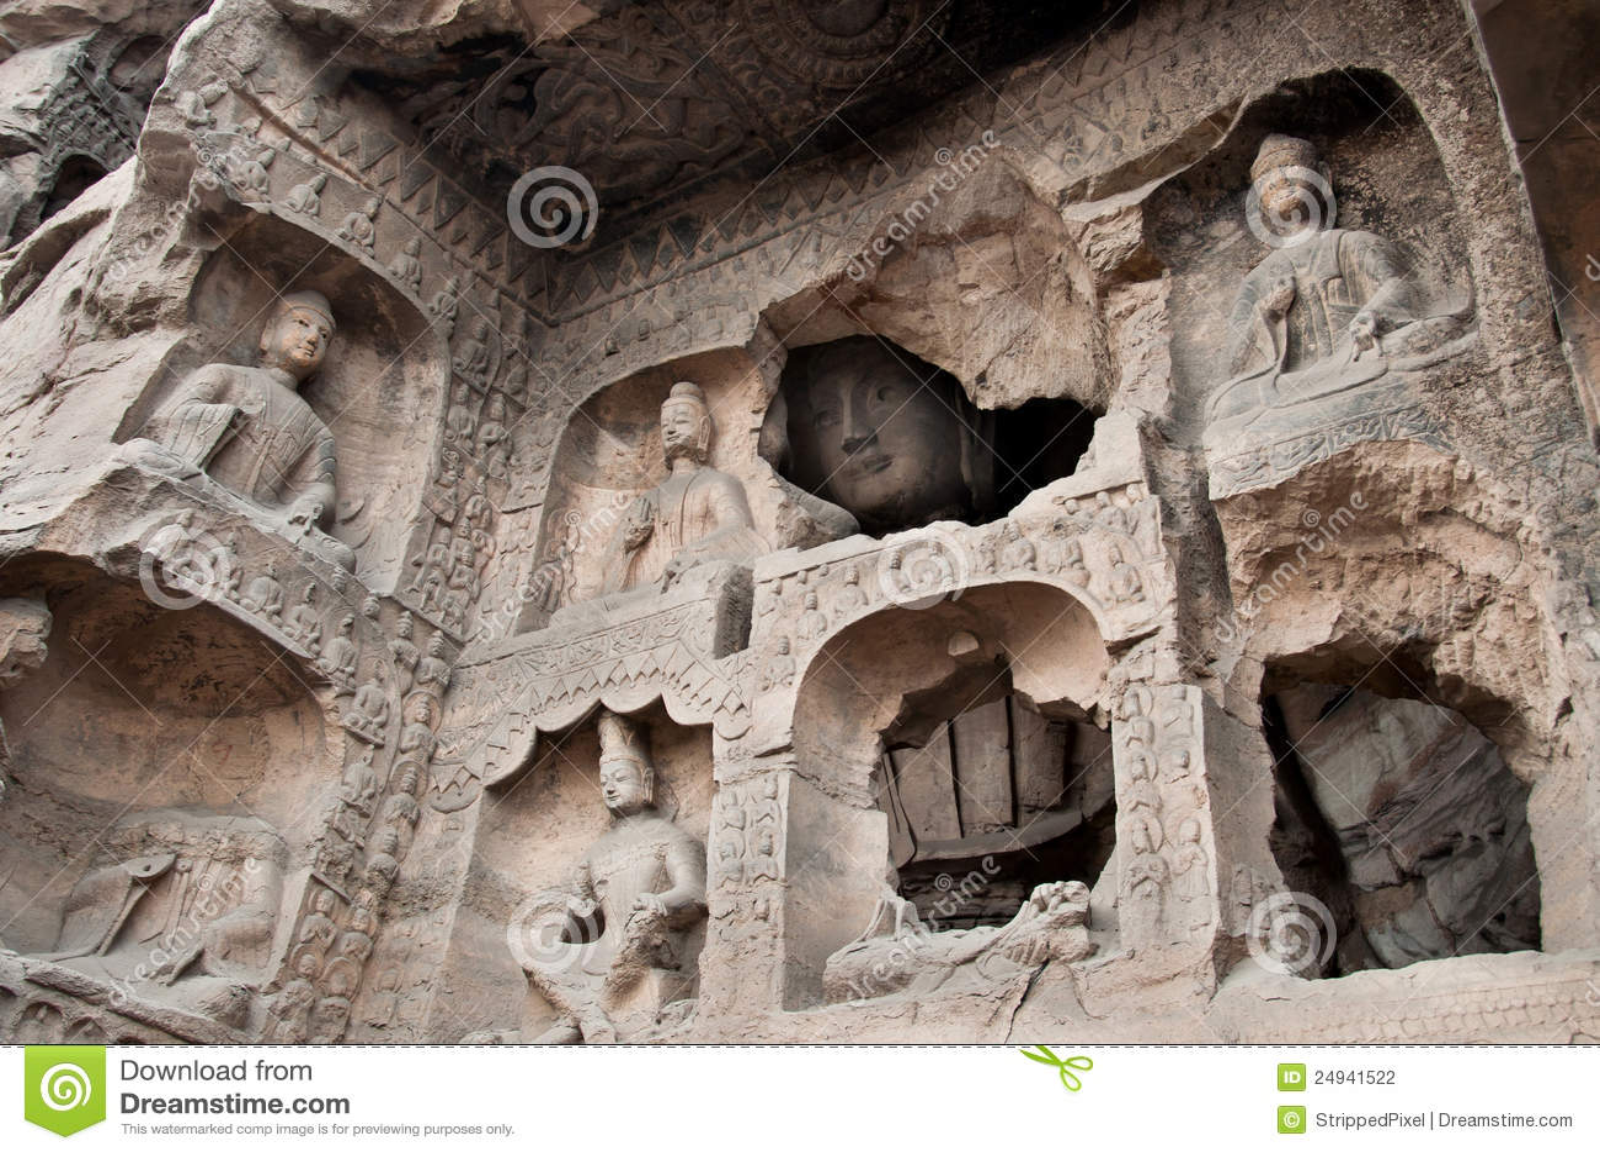 Carved buddhas at the yungang caves datong stock photo